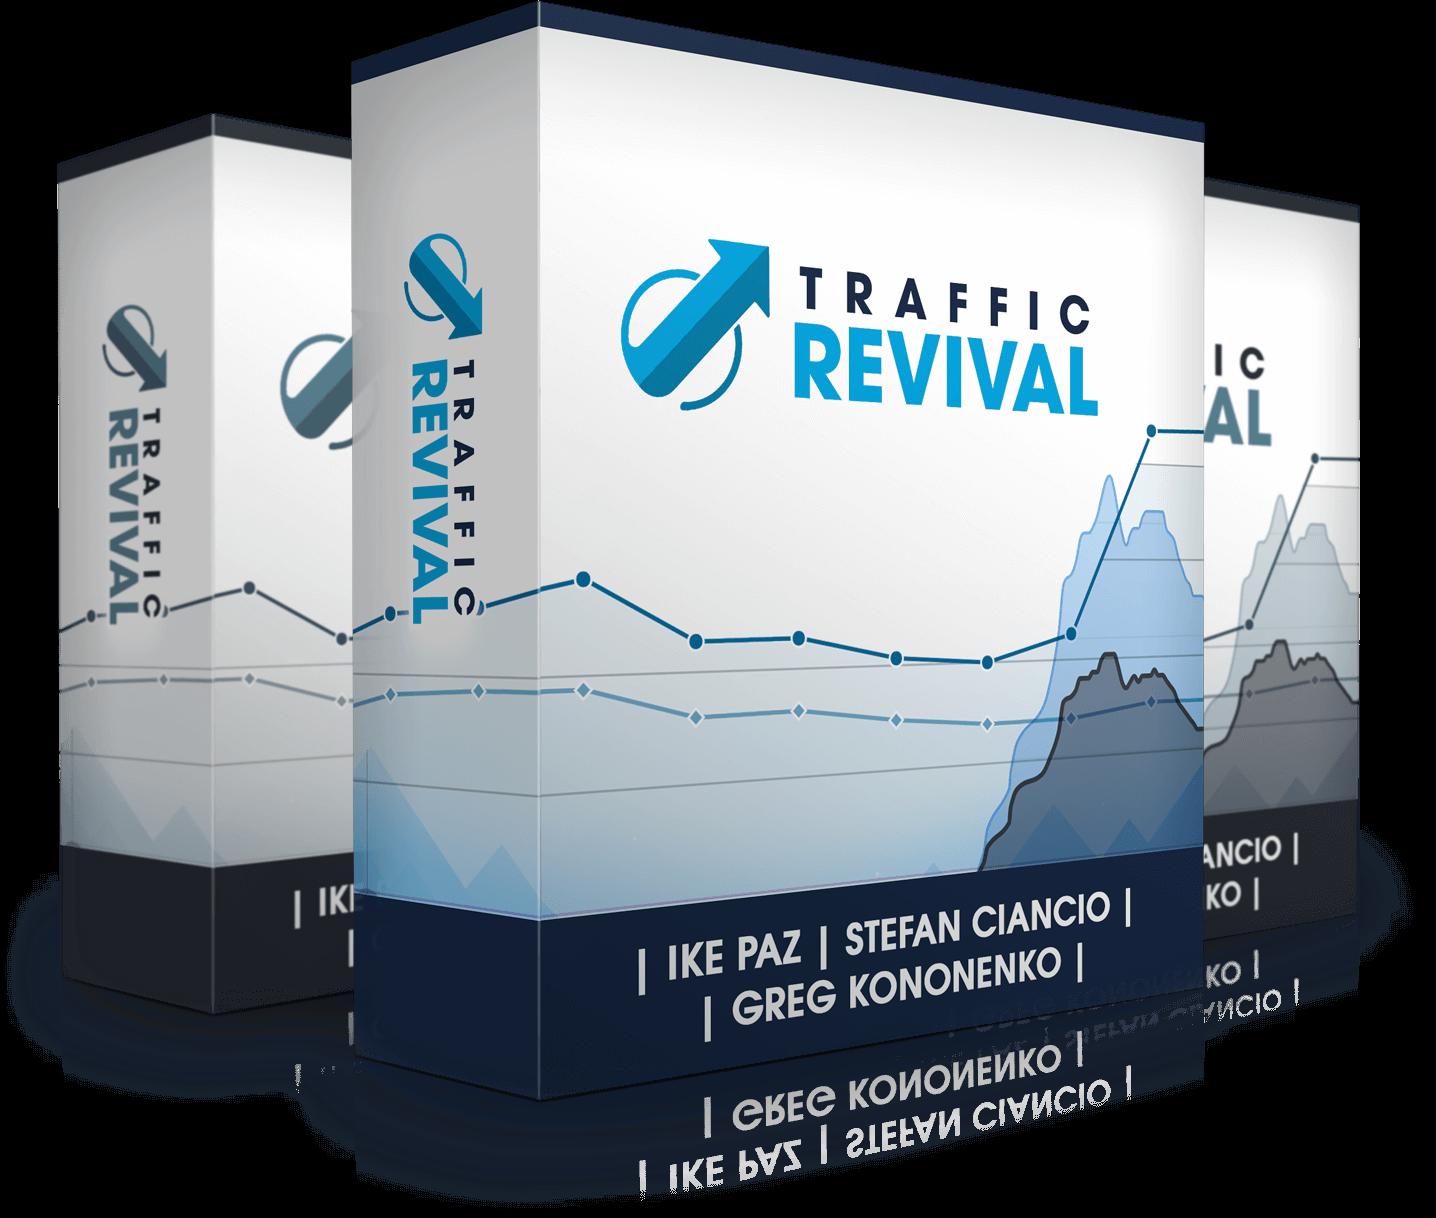 Traffic Revival